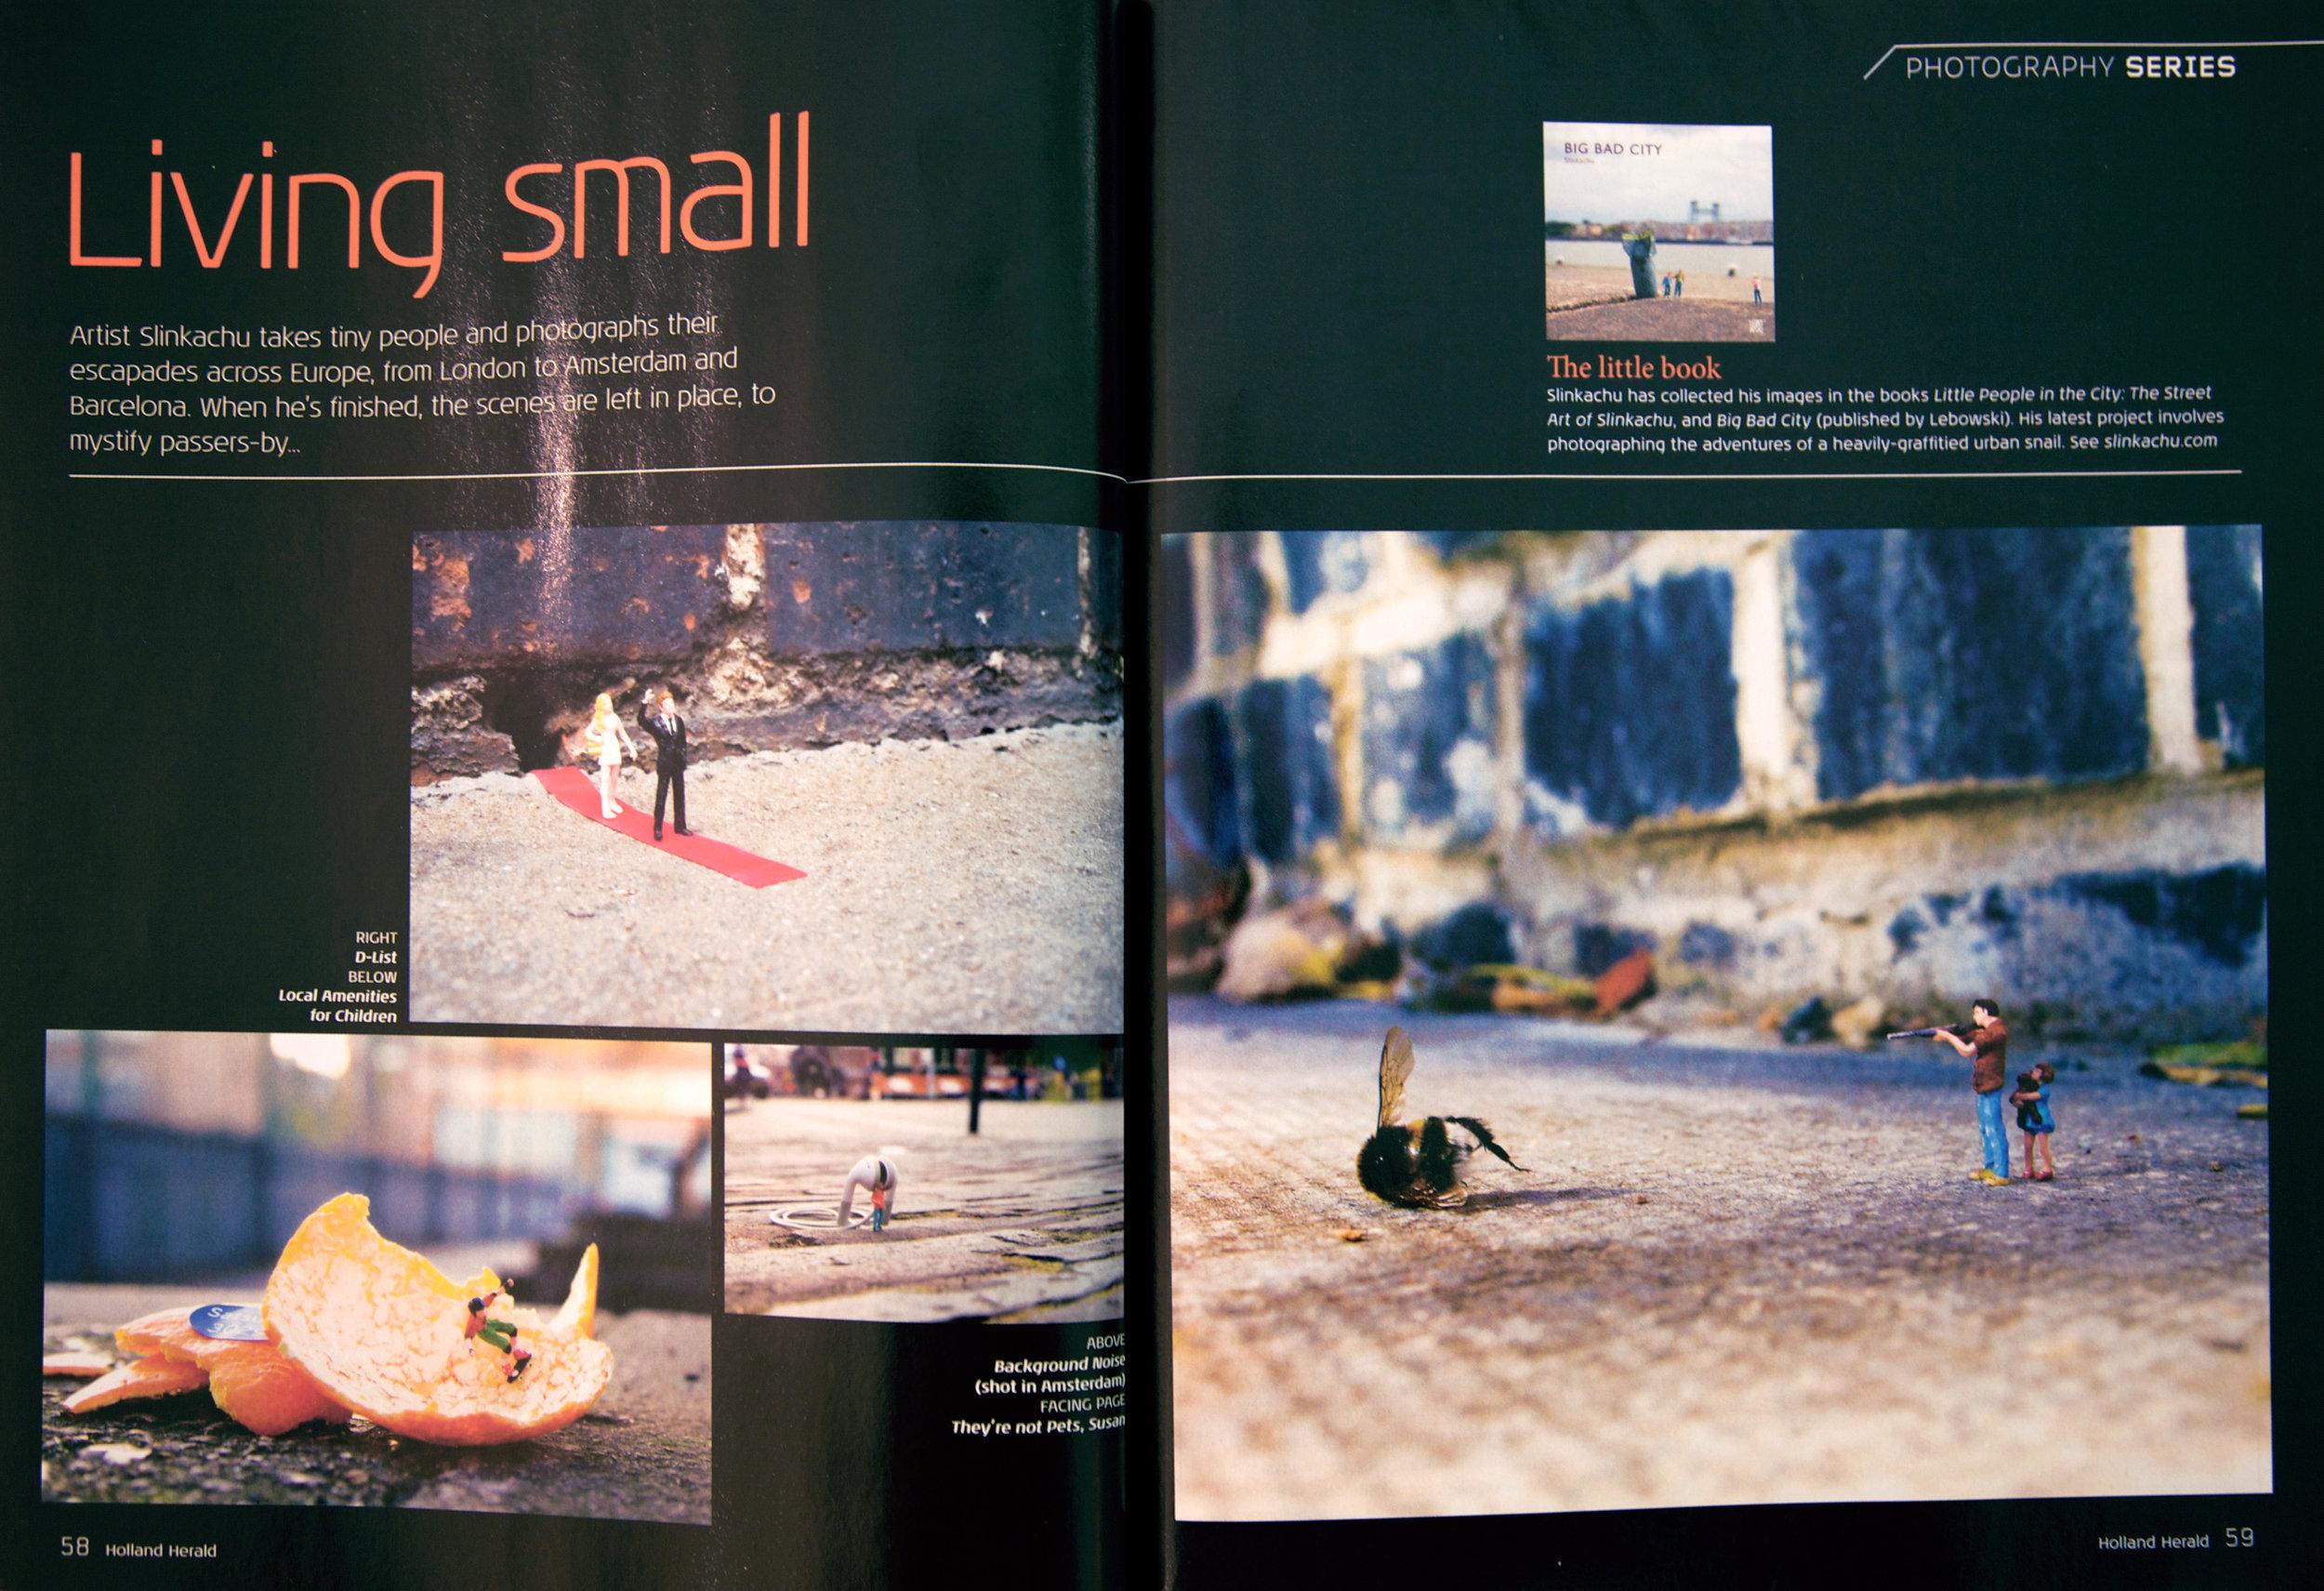 Holland Herald  (KLM inflight magazine) 2011